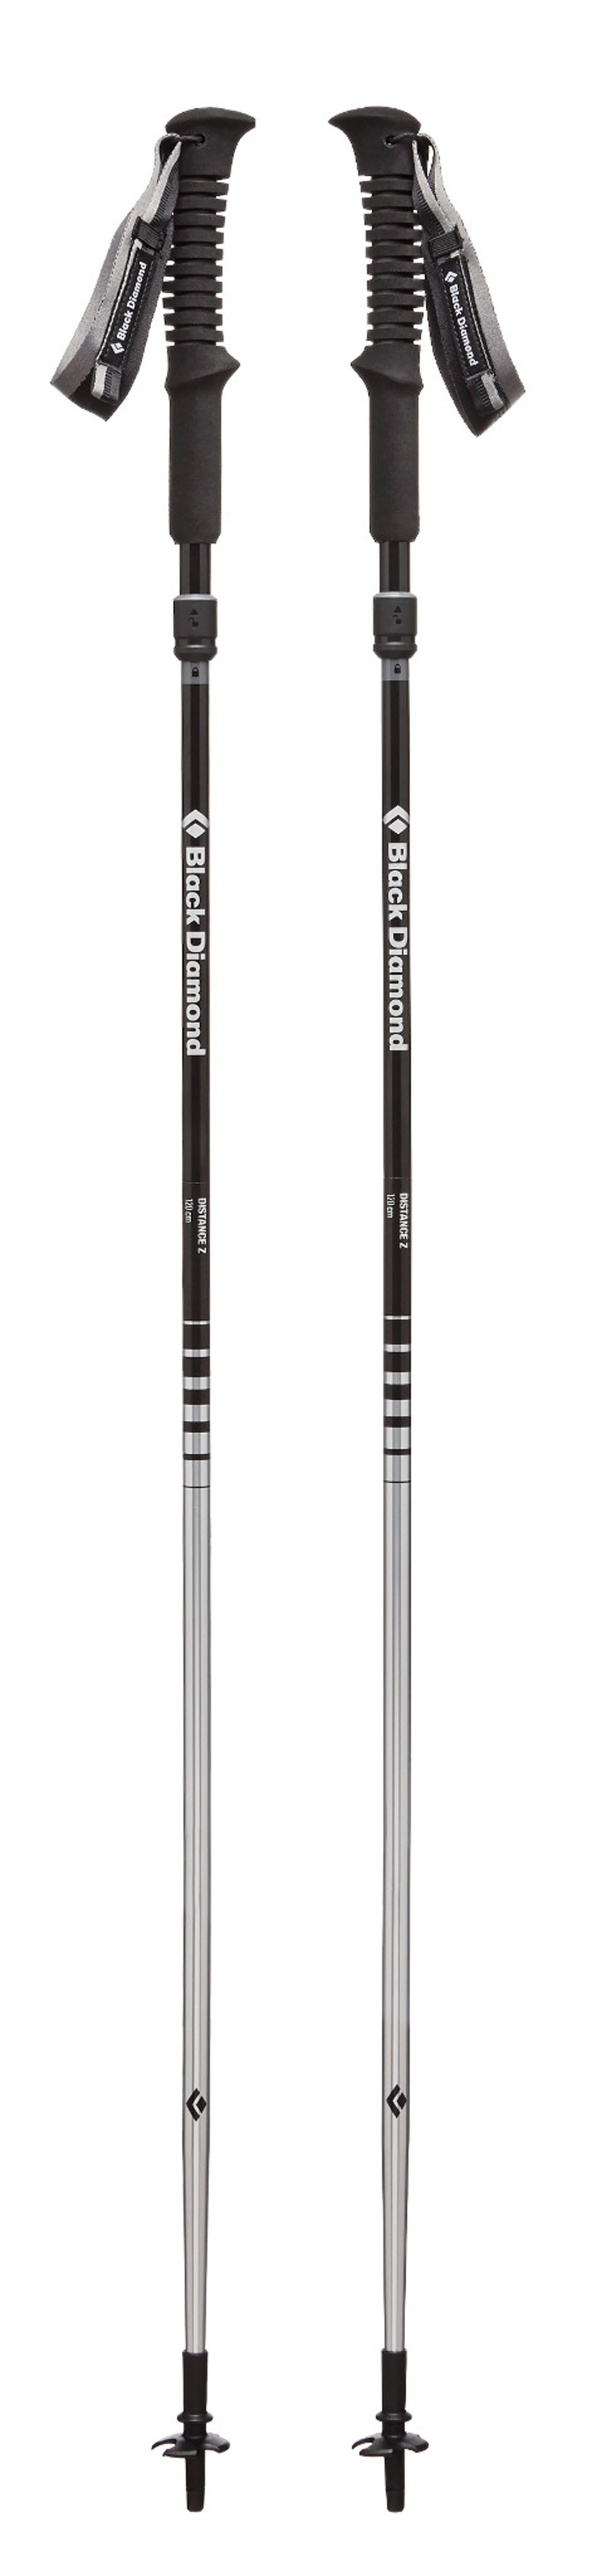 Black Diamond Distance Z Trekking Poles 110 cm